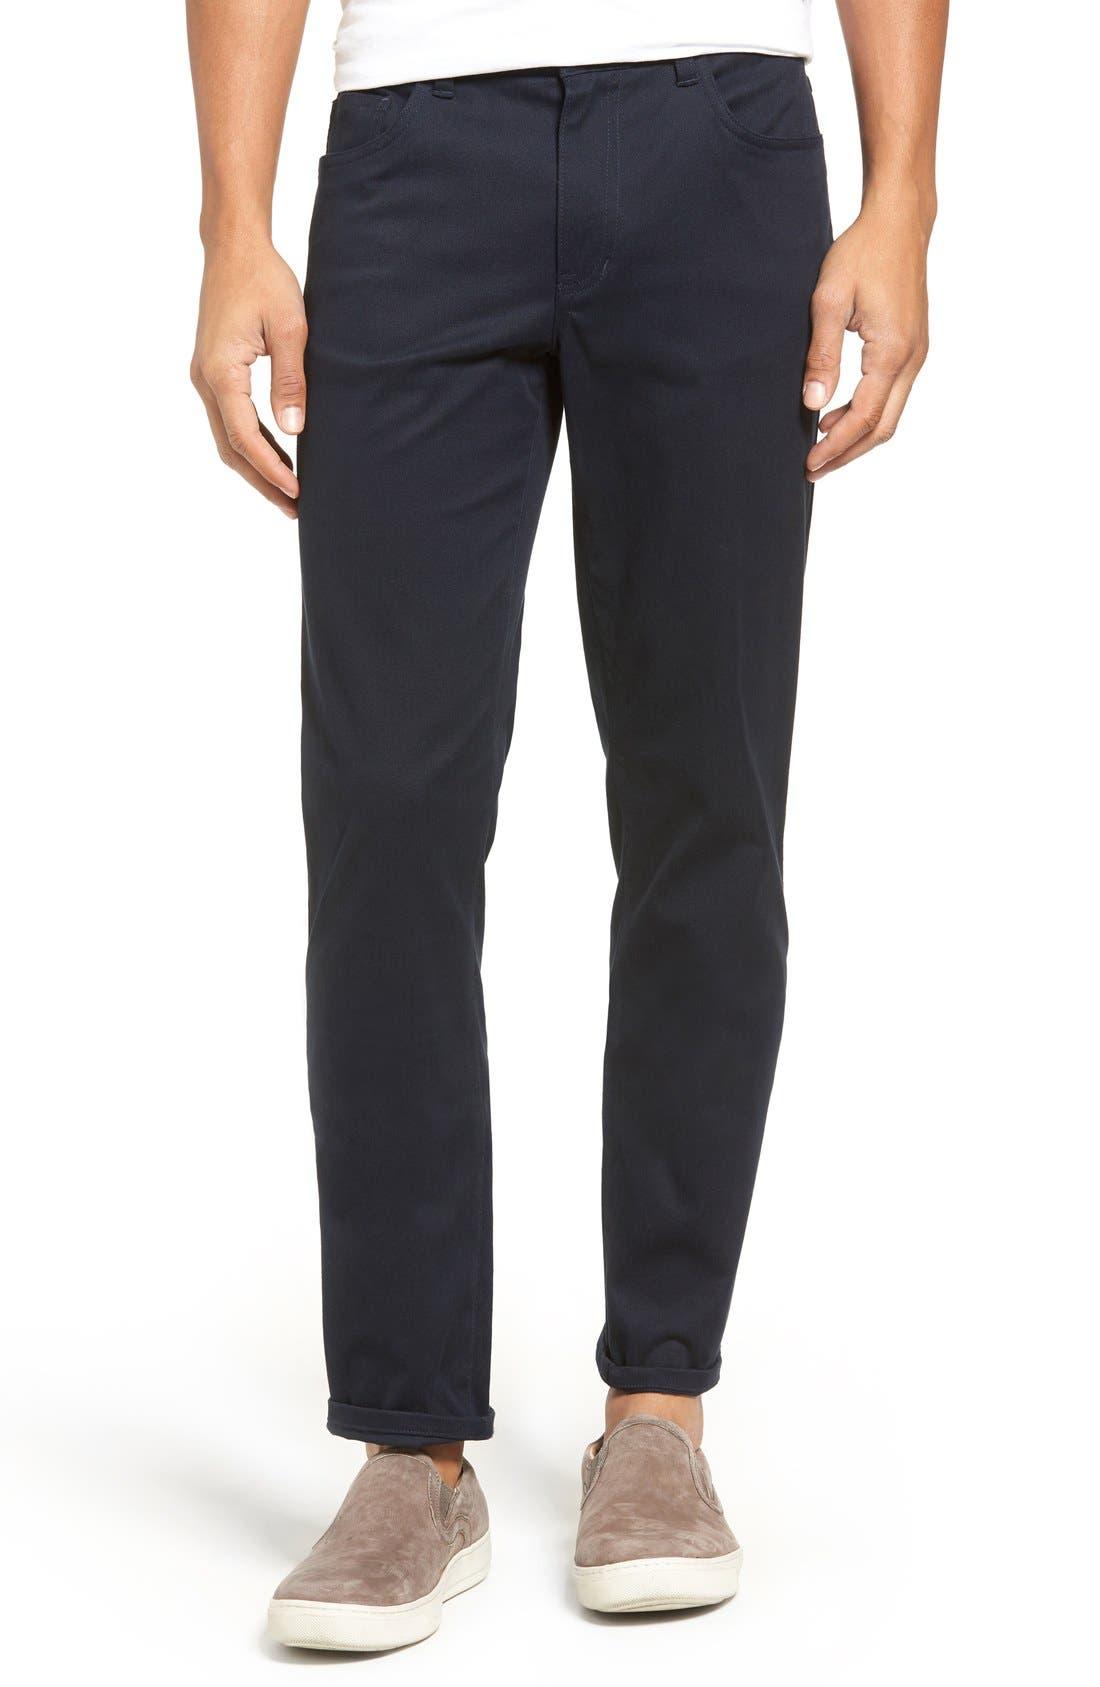 Soho Slim Fit Five-Pocket Pants,                             Alternate thumbnail 9, color,                             COASTAL